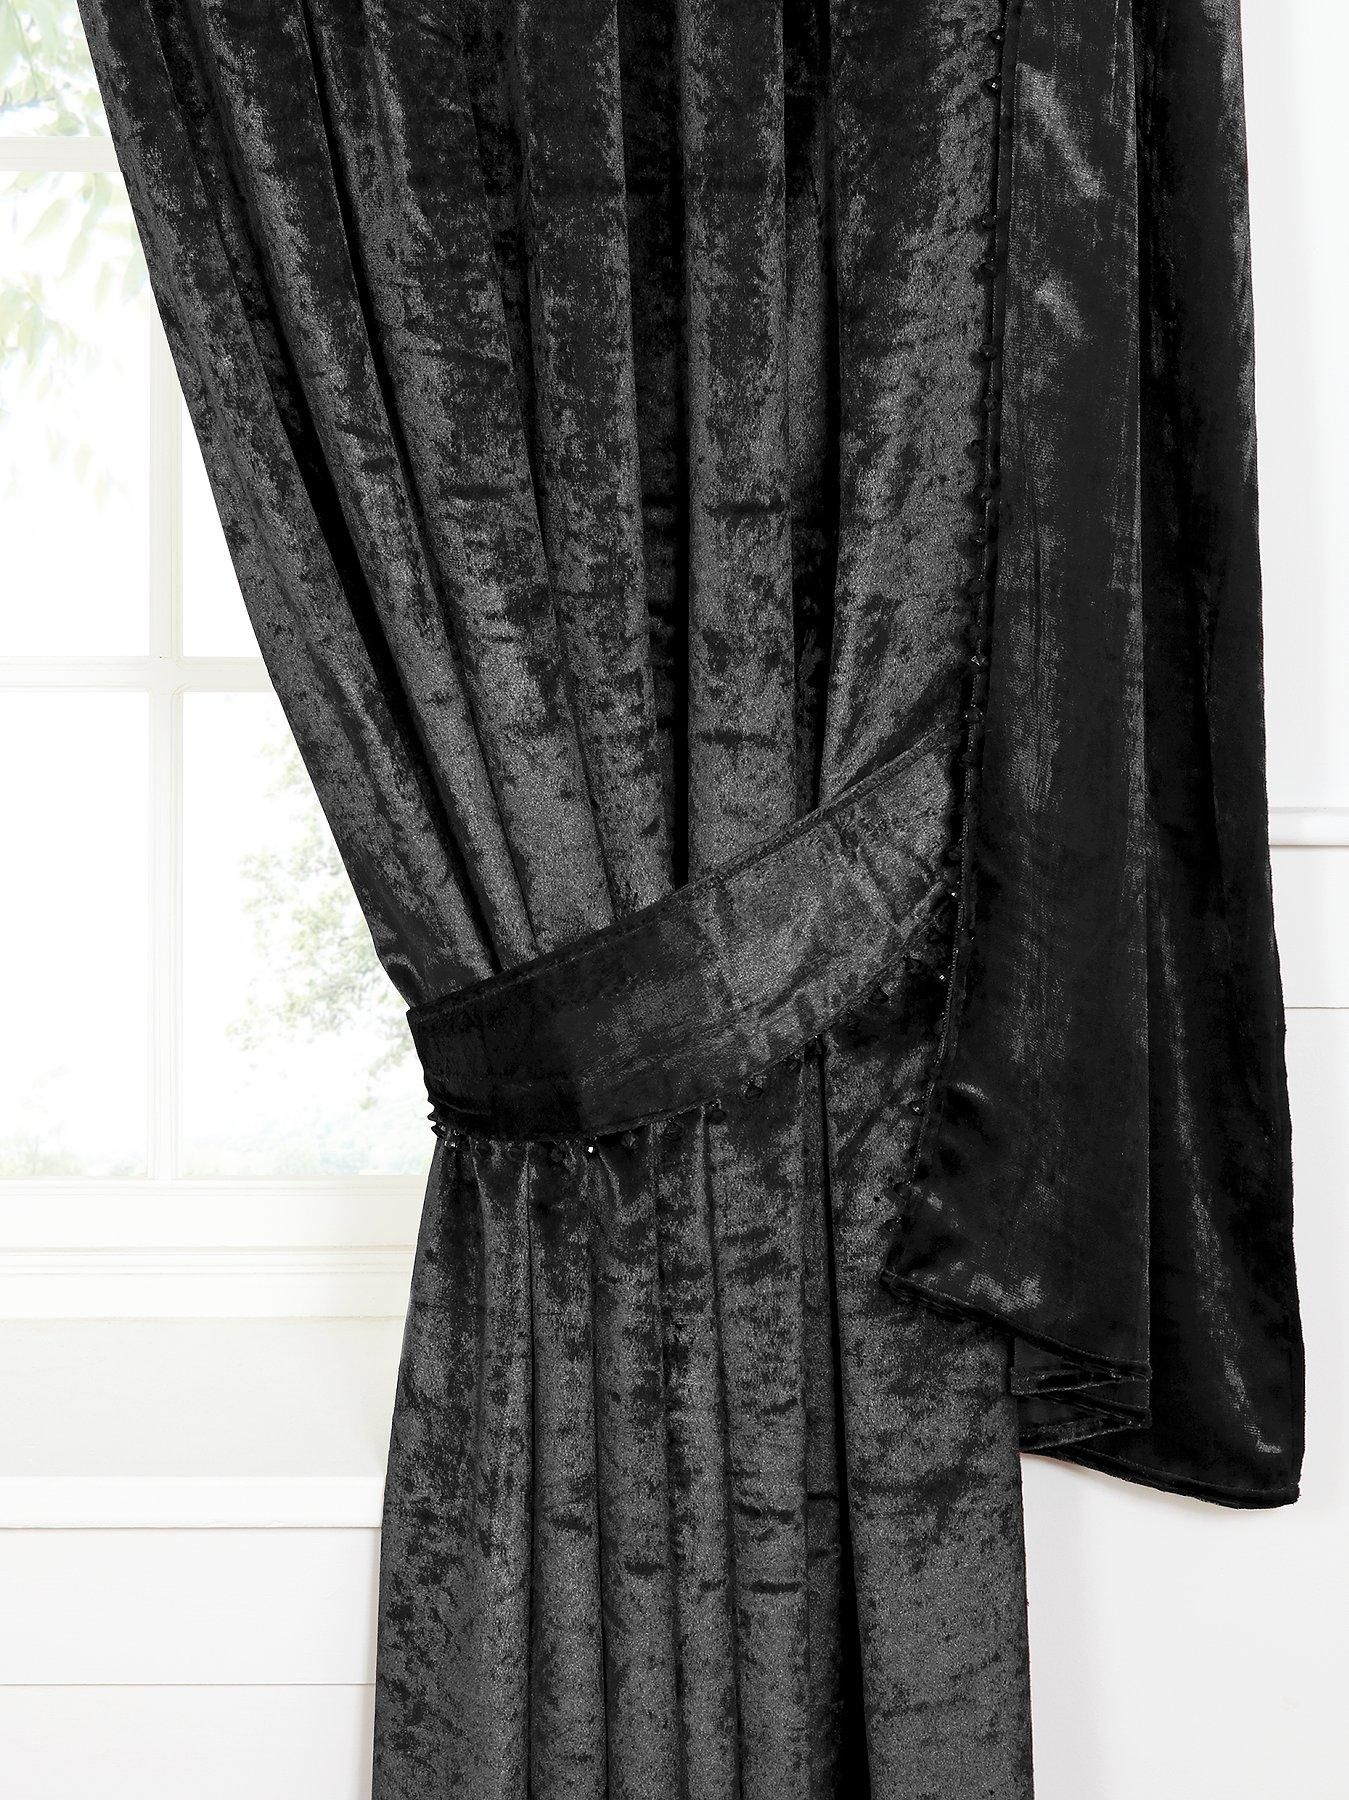 Laurence Llewellyn Bowen Venezia Black Crushed Velvet Curtains